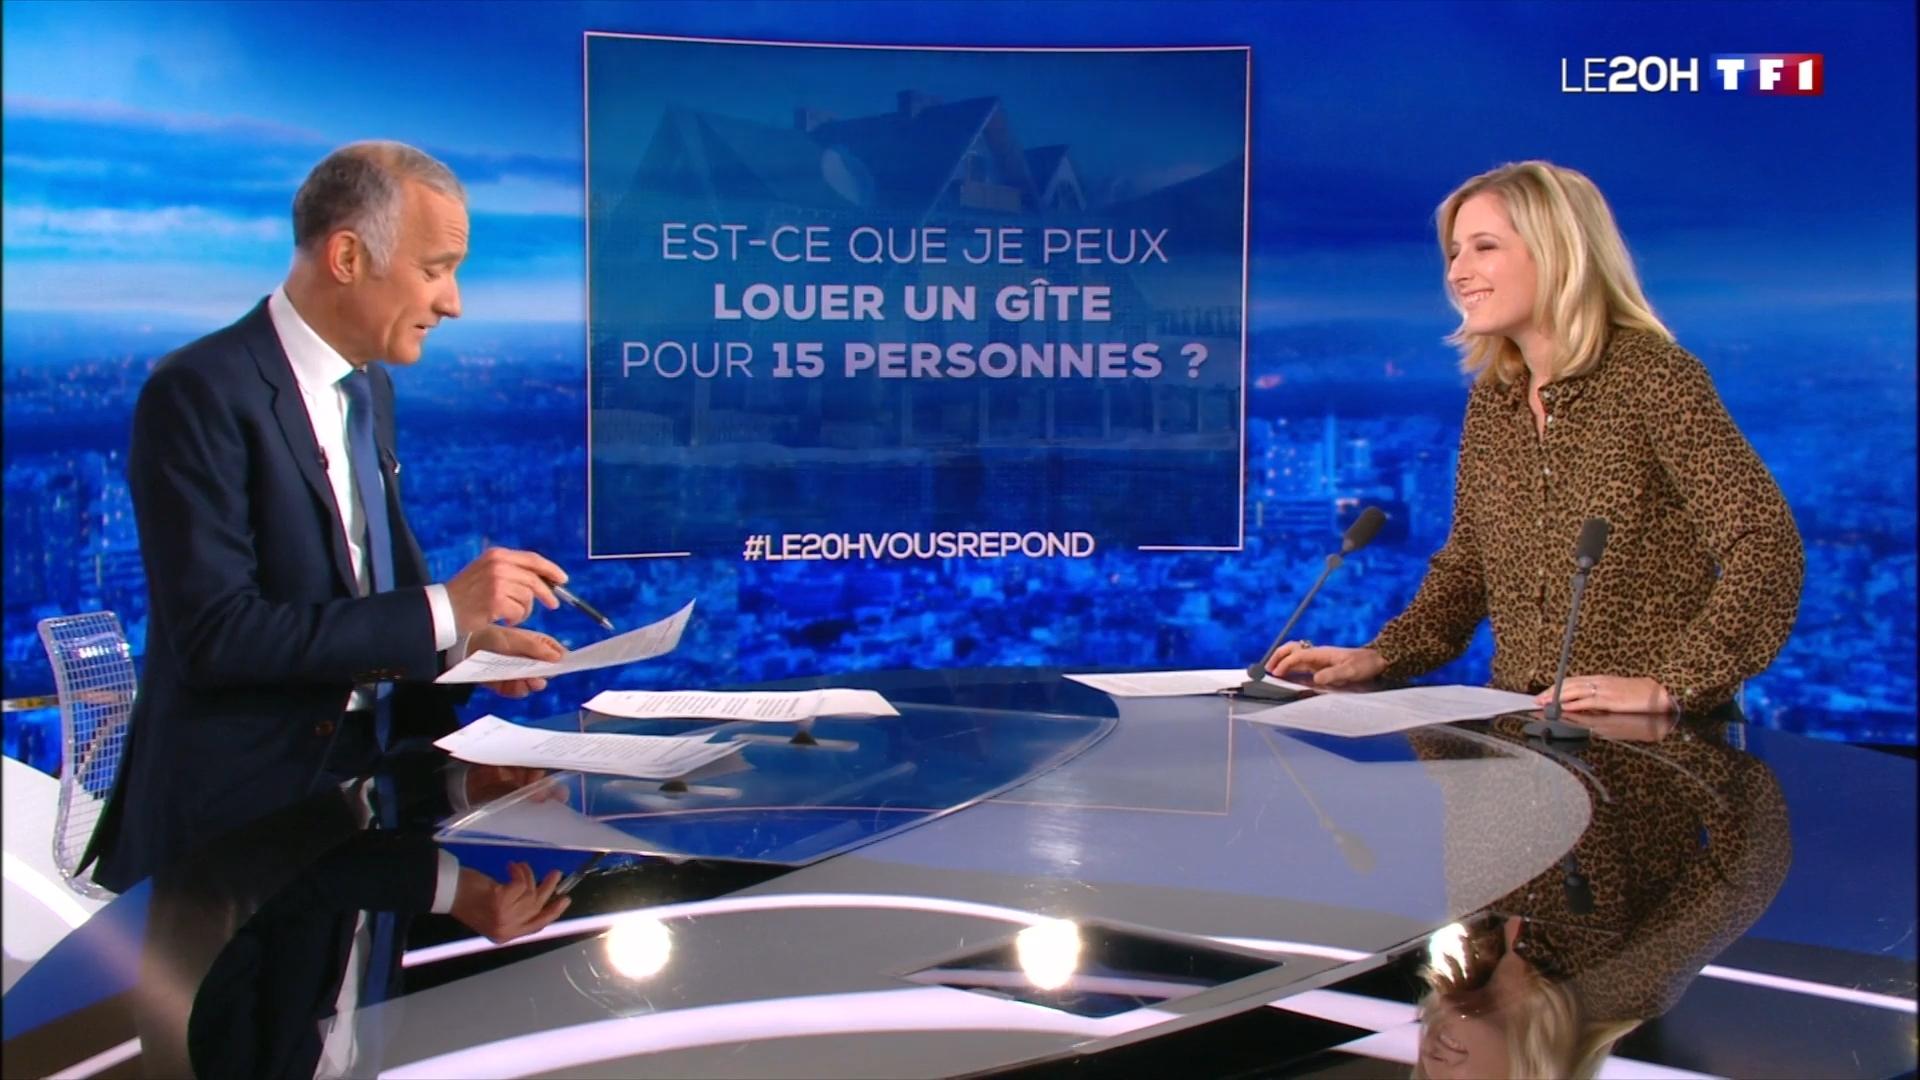 2021-02-10_20_00_TF1_Le-20h.mp4_snapshot_00.43.20.097.jpg